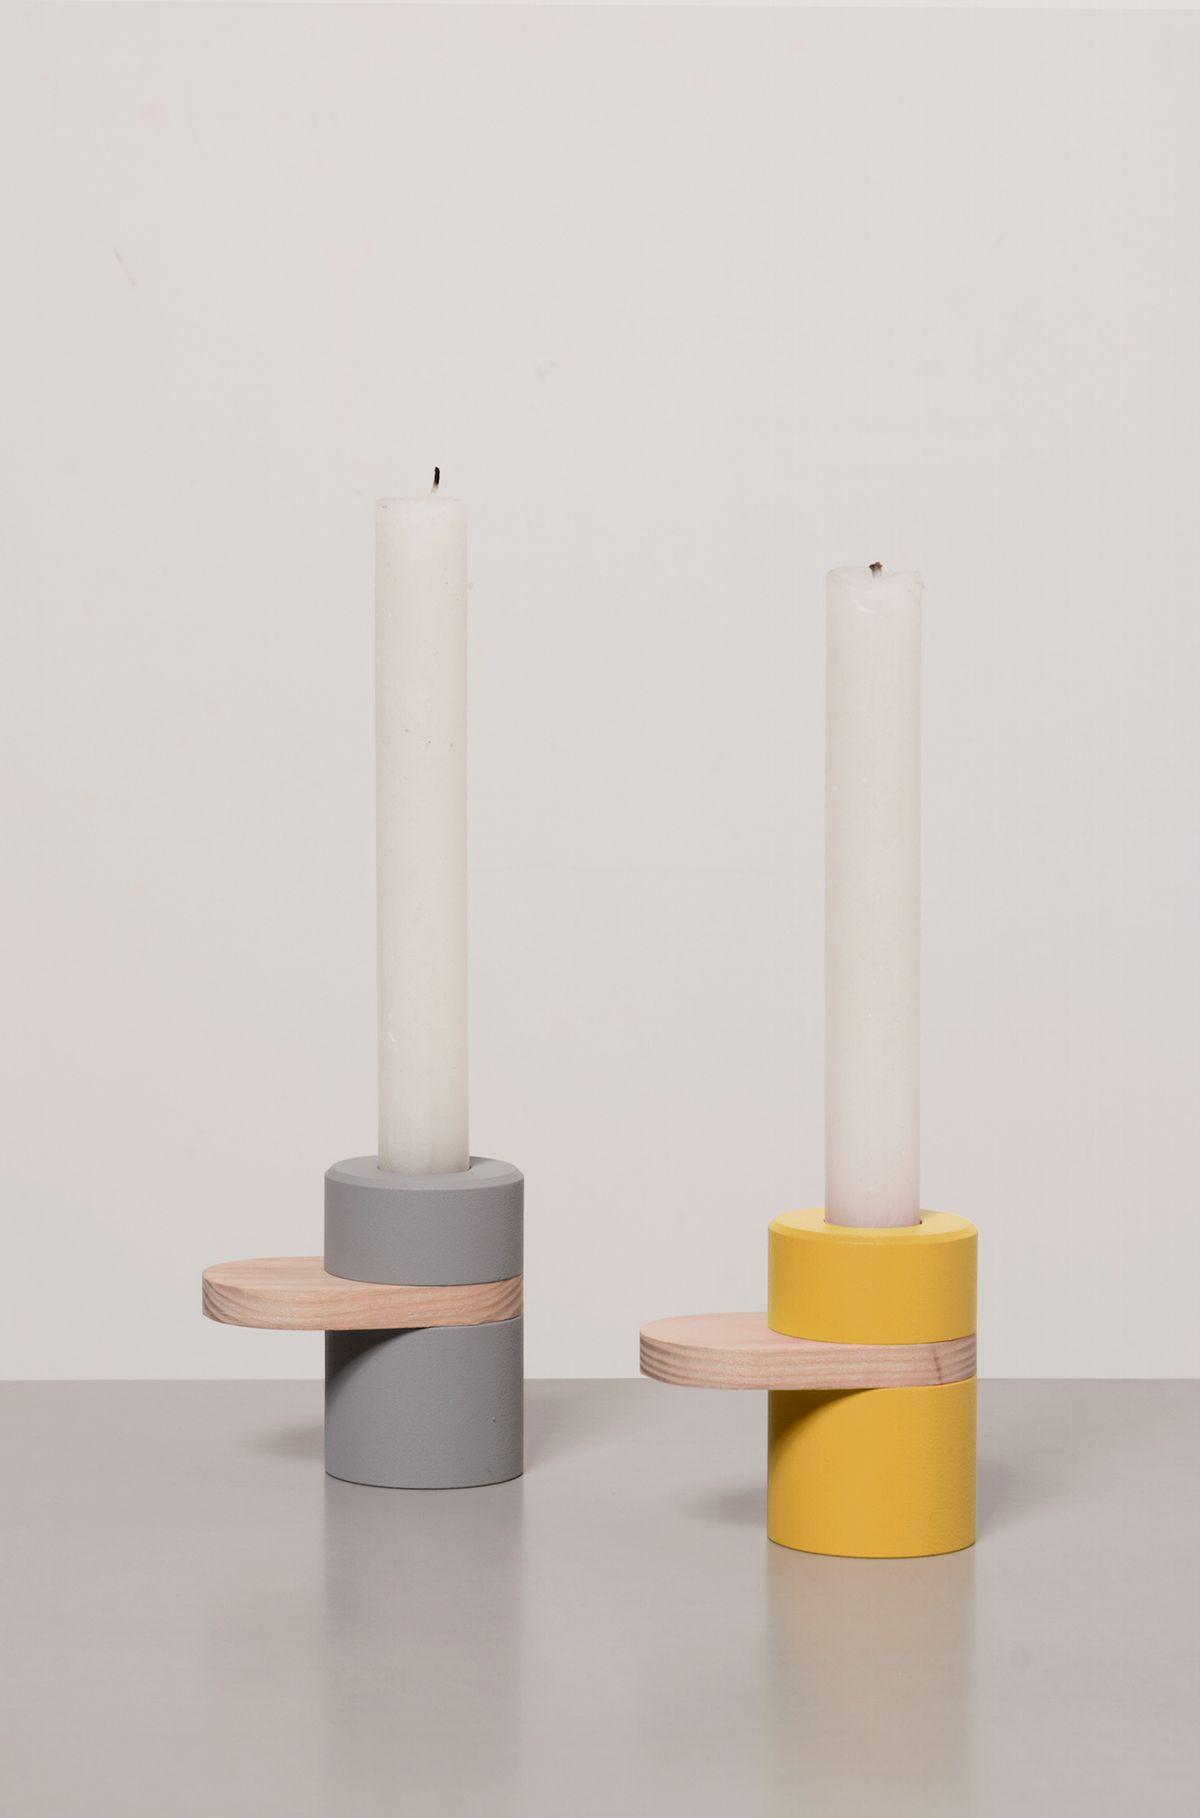 HEAVY CREAM (Candle holder) on Behance